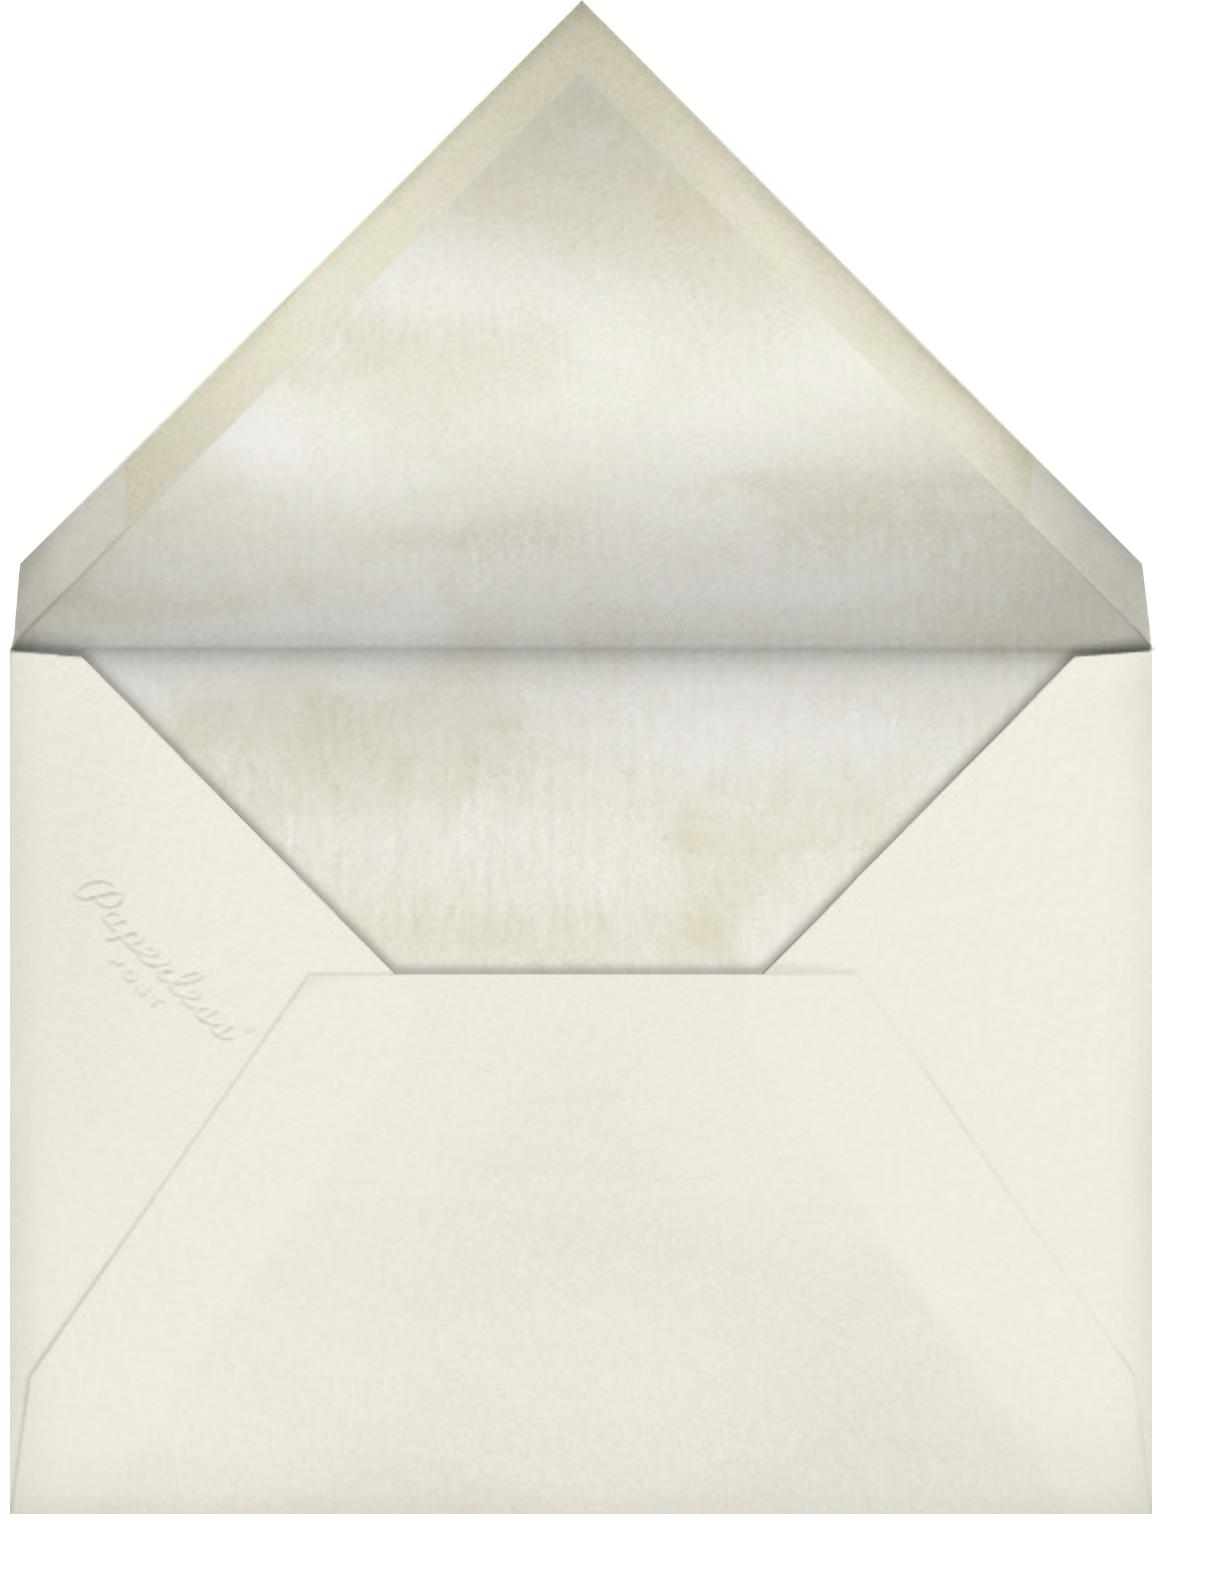 Spring Border (Invitation) - Felix Doolittle - All - envelope back